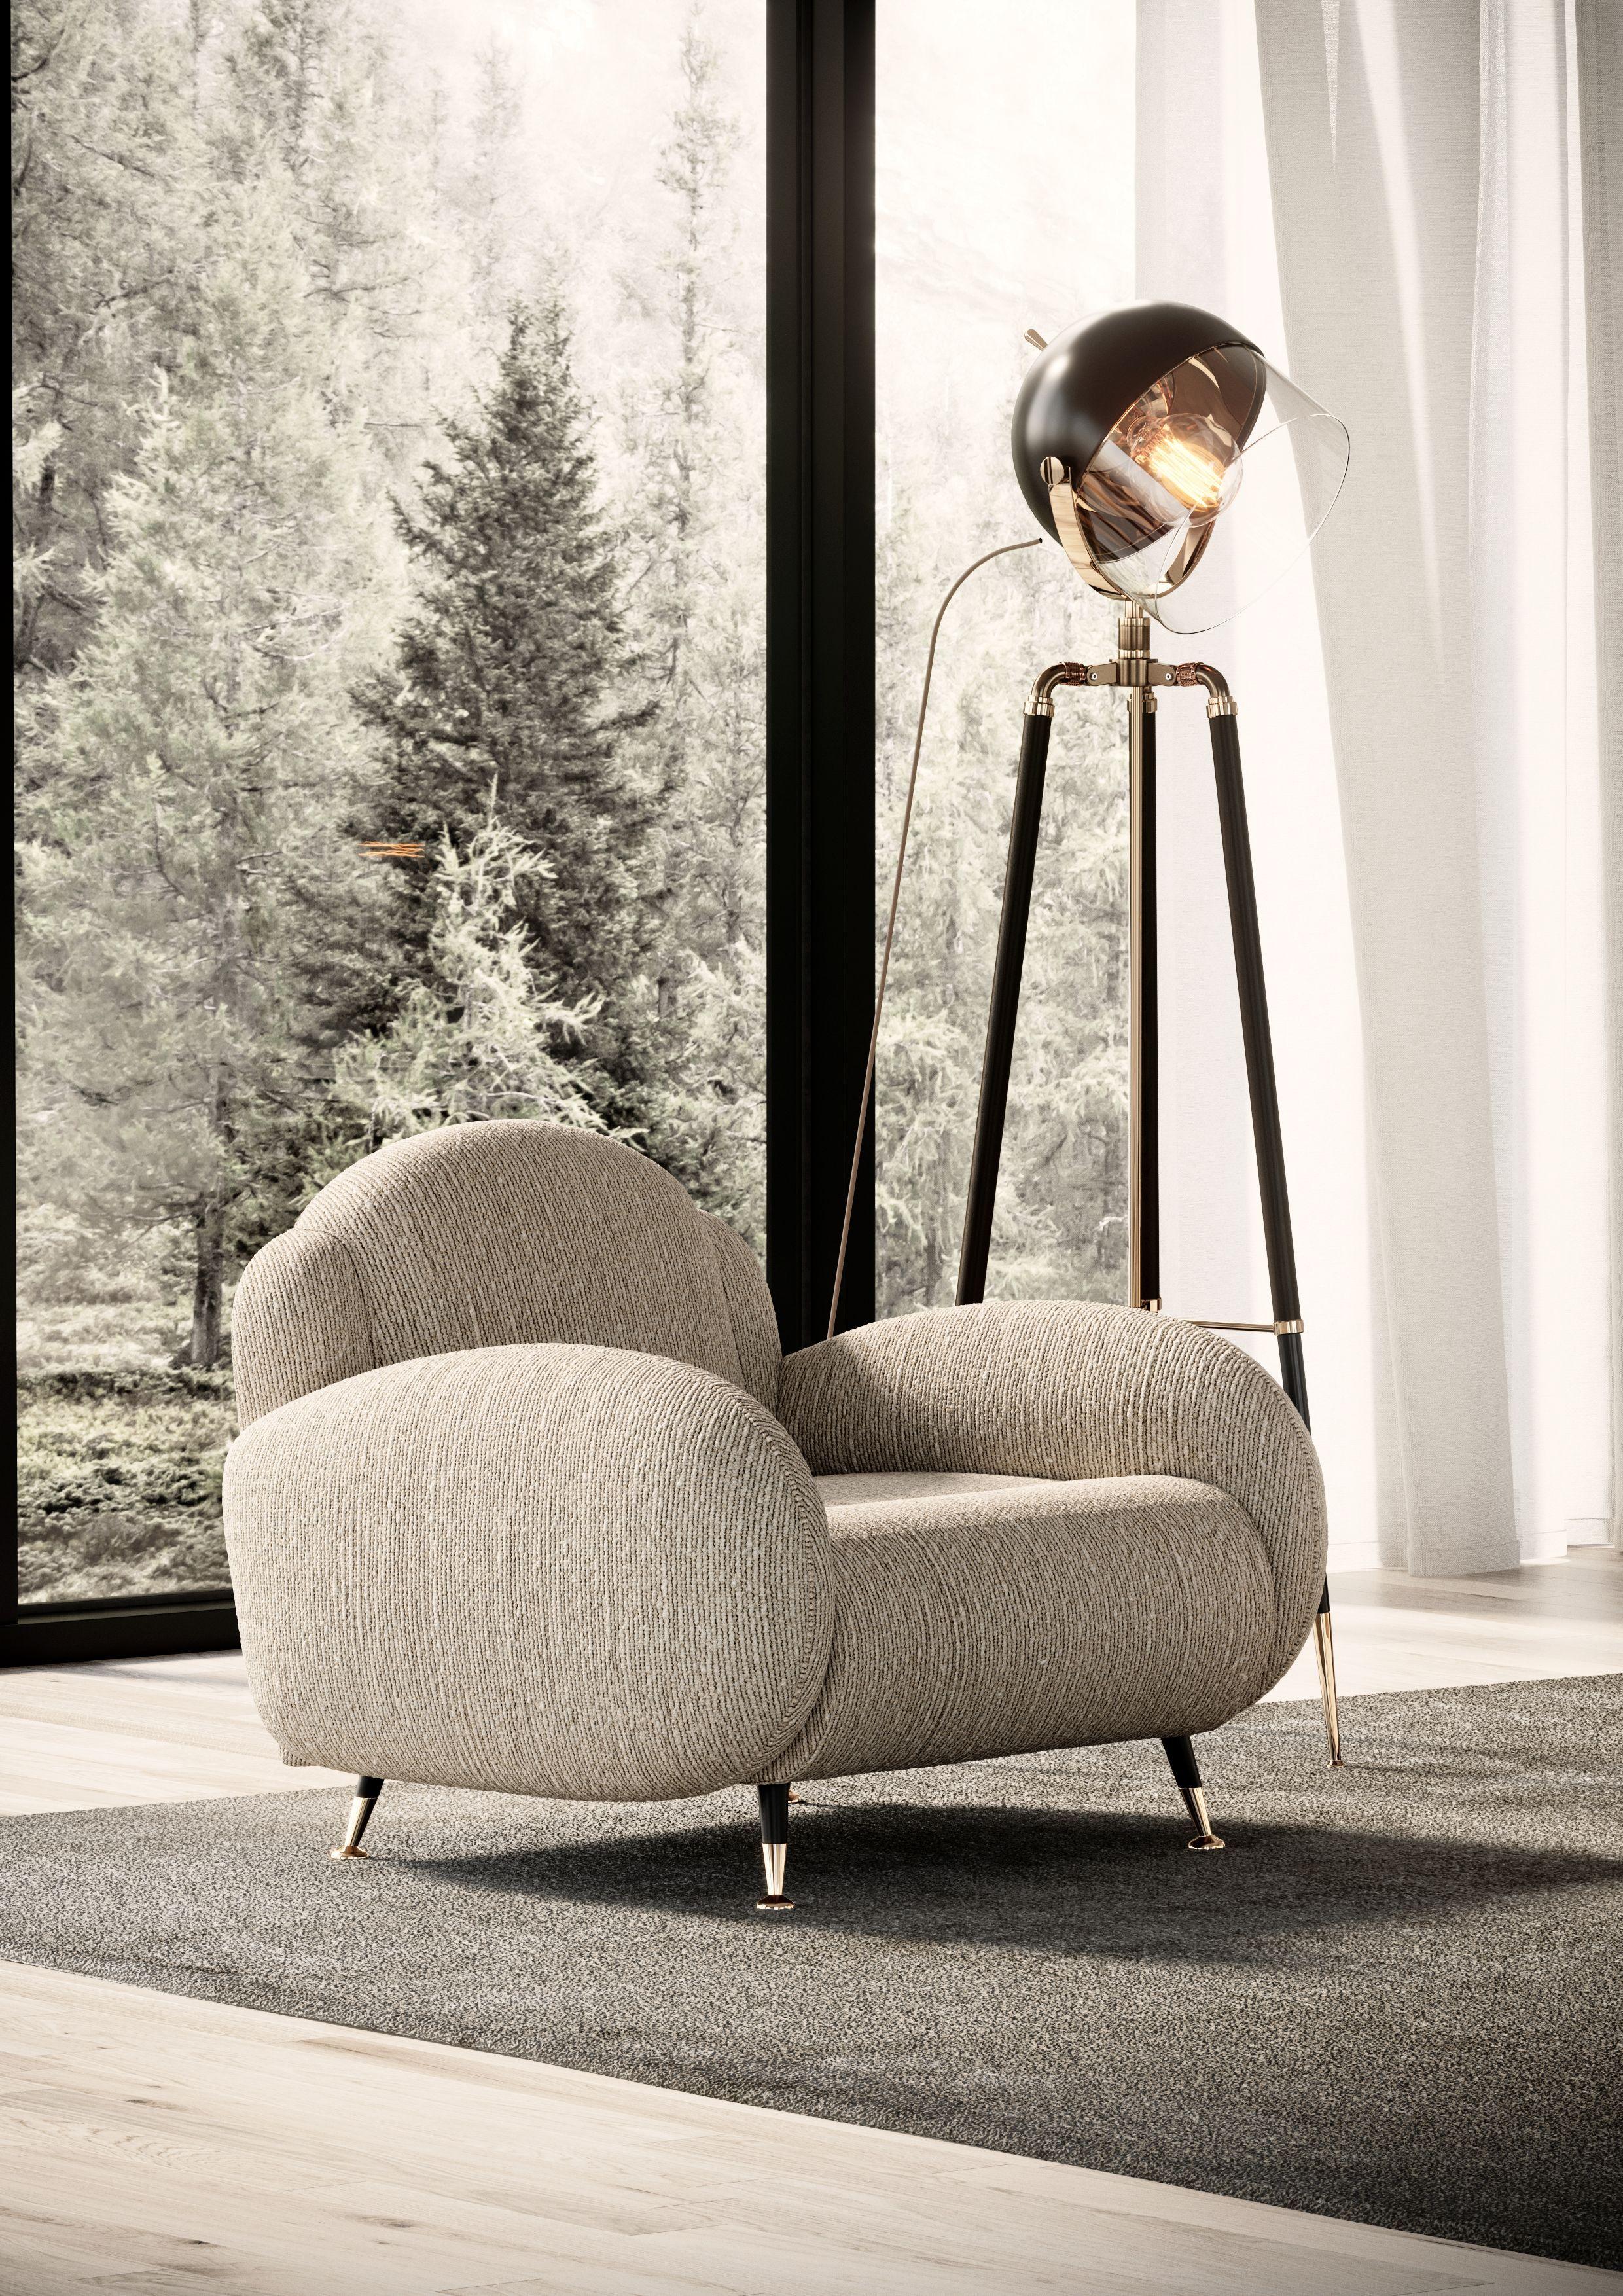 Pin By Wangyujie On 单椅 In 2020 Interior Design Lounge Elegant